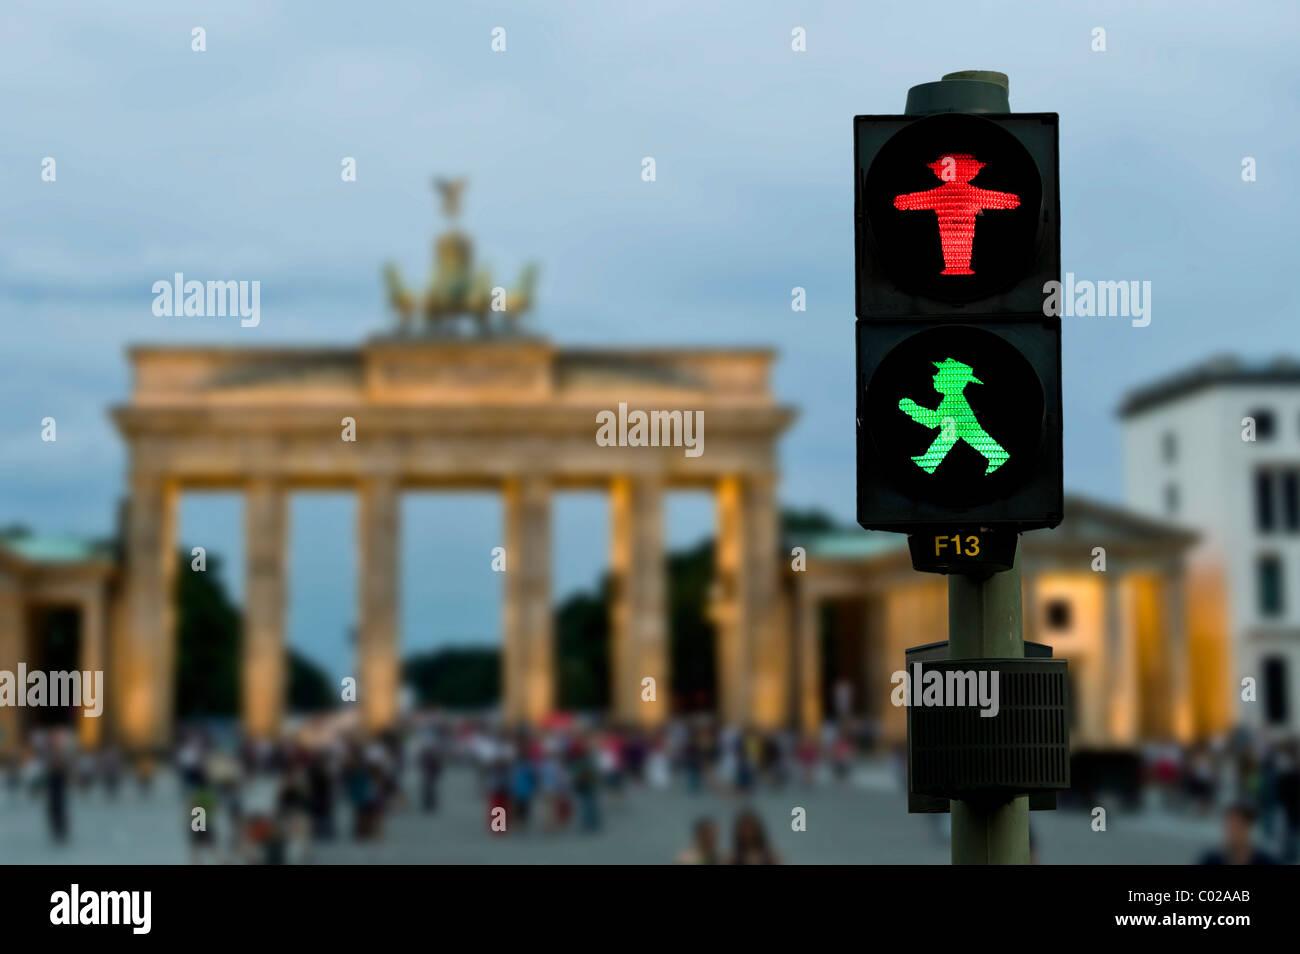 Brandenburg Gate with pedestrian traffic light, photo composition, Berlin, Germany, Europe - Stock Image